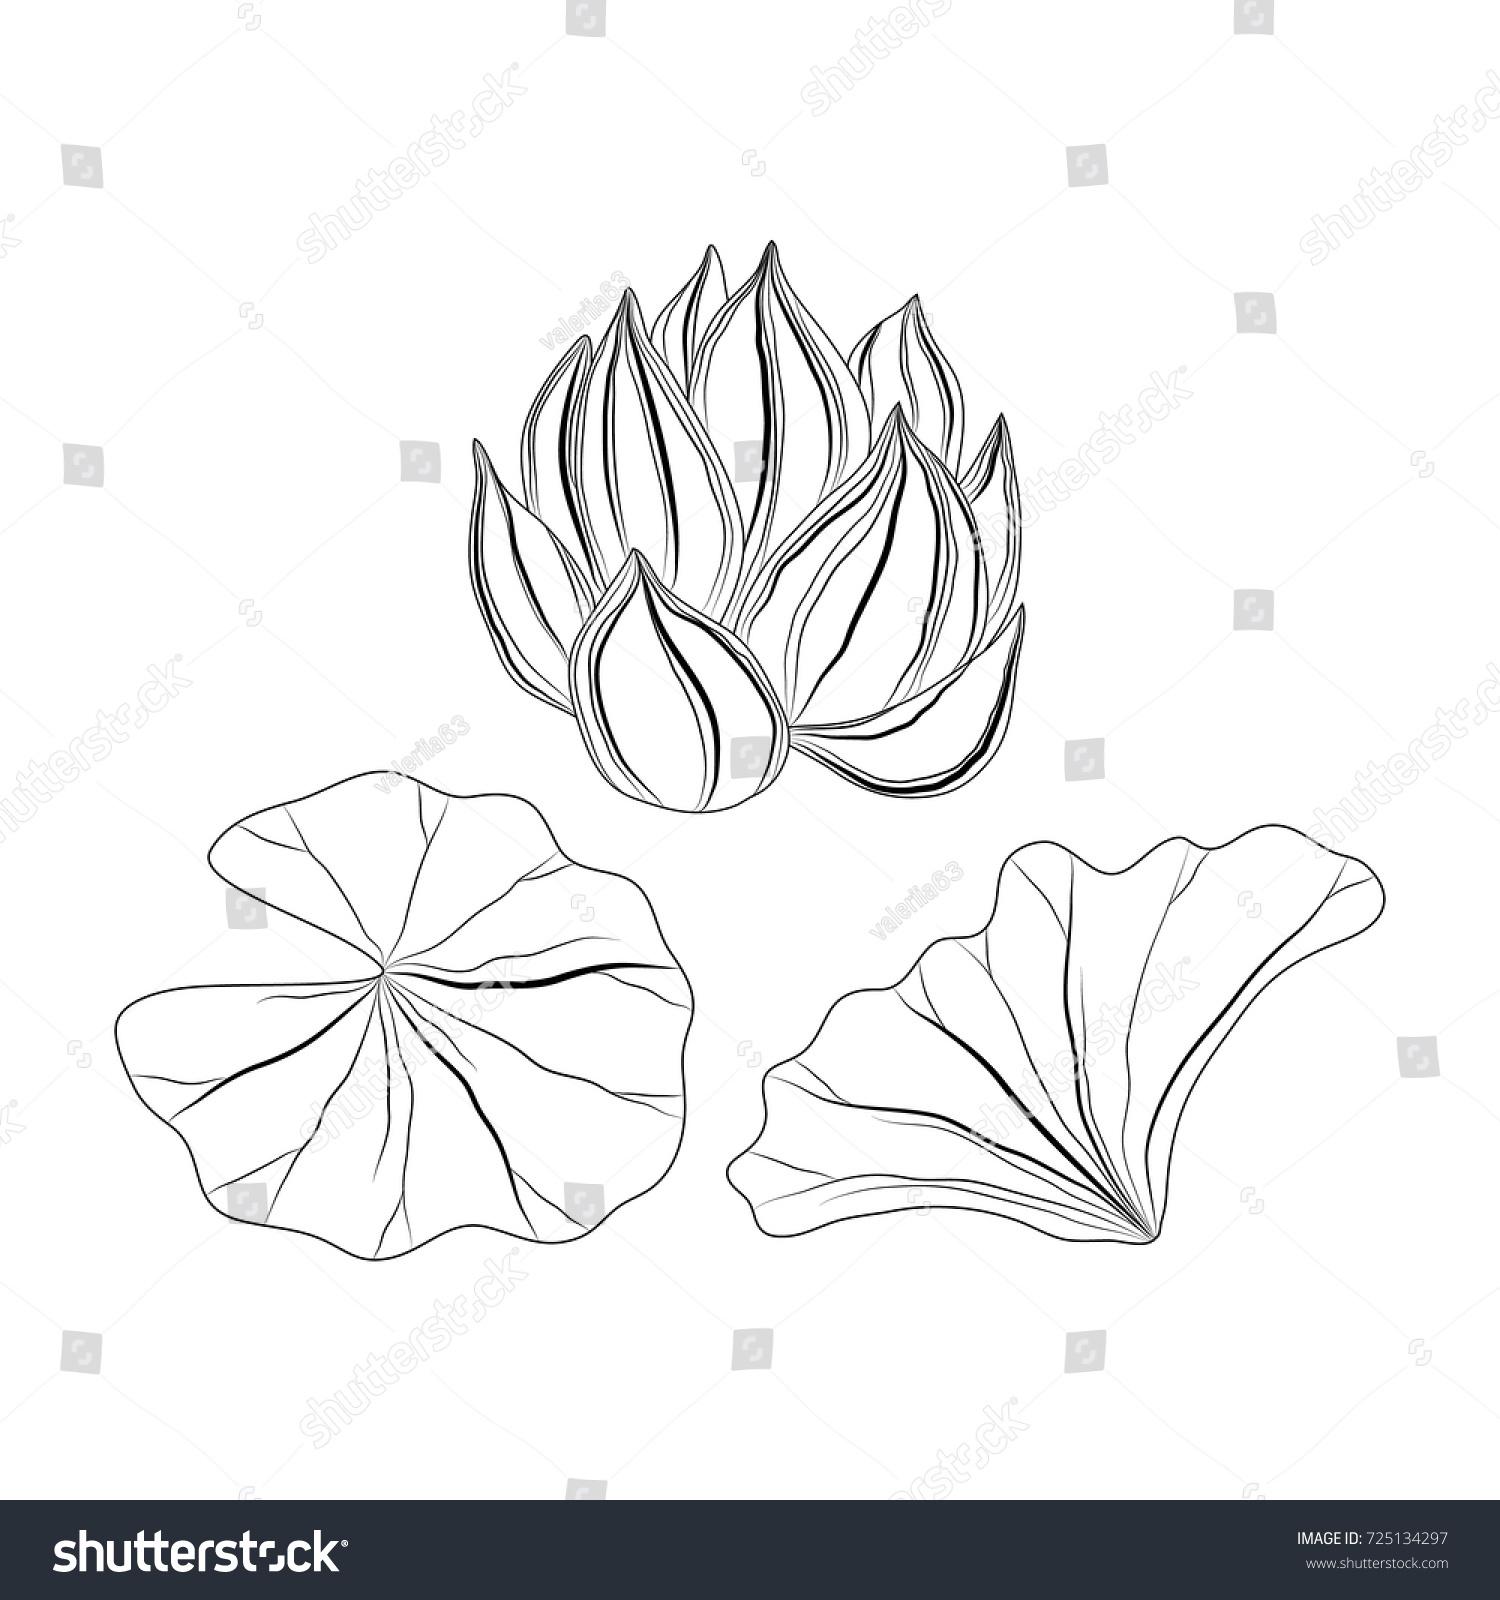 Sketch lotus flower leafsvector illustration stock vector 725134297 sketch of lotus flower and leafsctor illustration izmirmasajfo